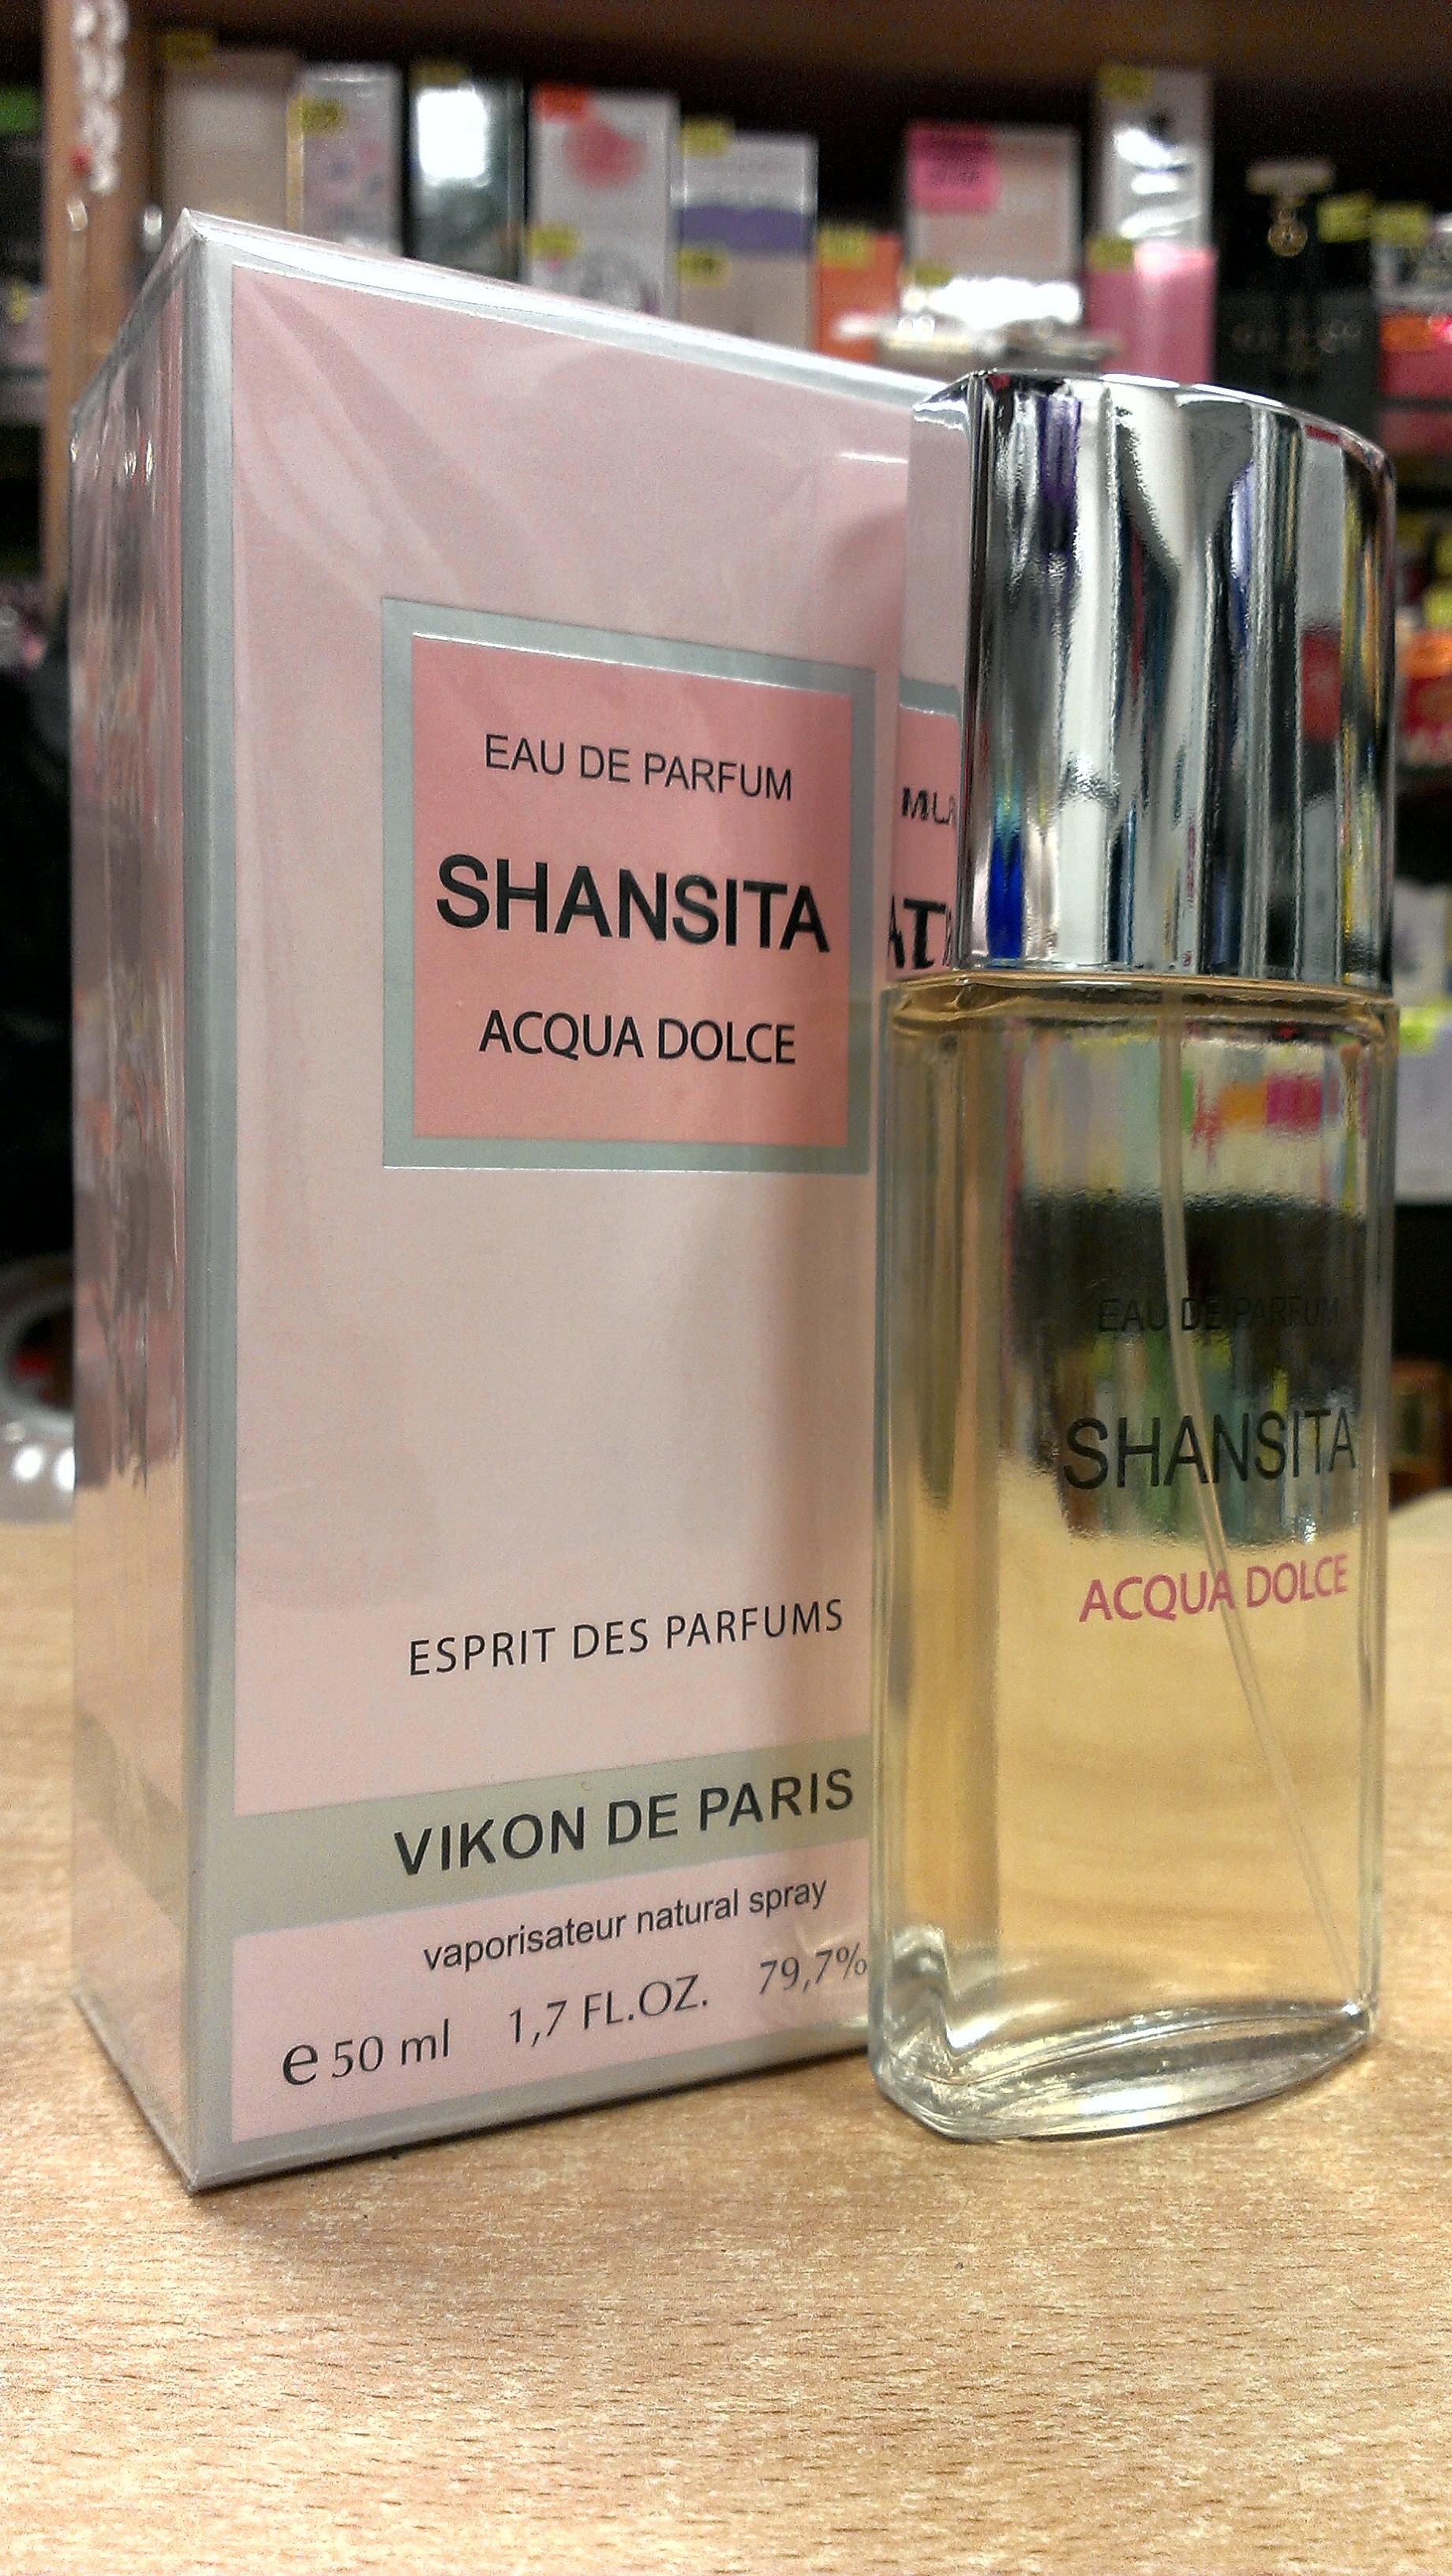 женская парфюмерная вода   Дух Духов  Шансита Acqua Dolce  50 мл.